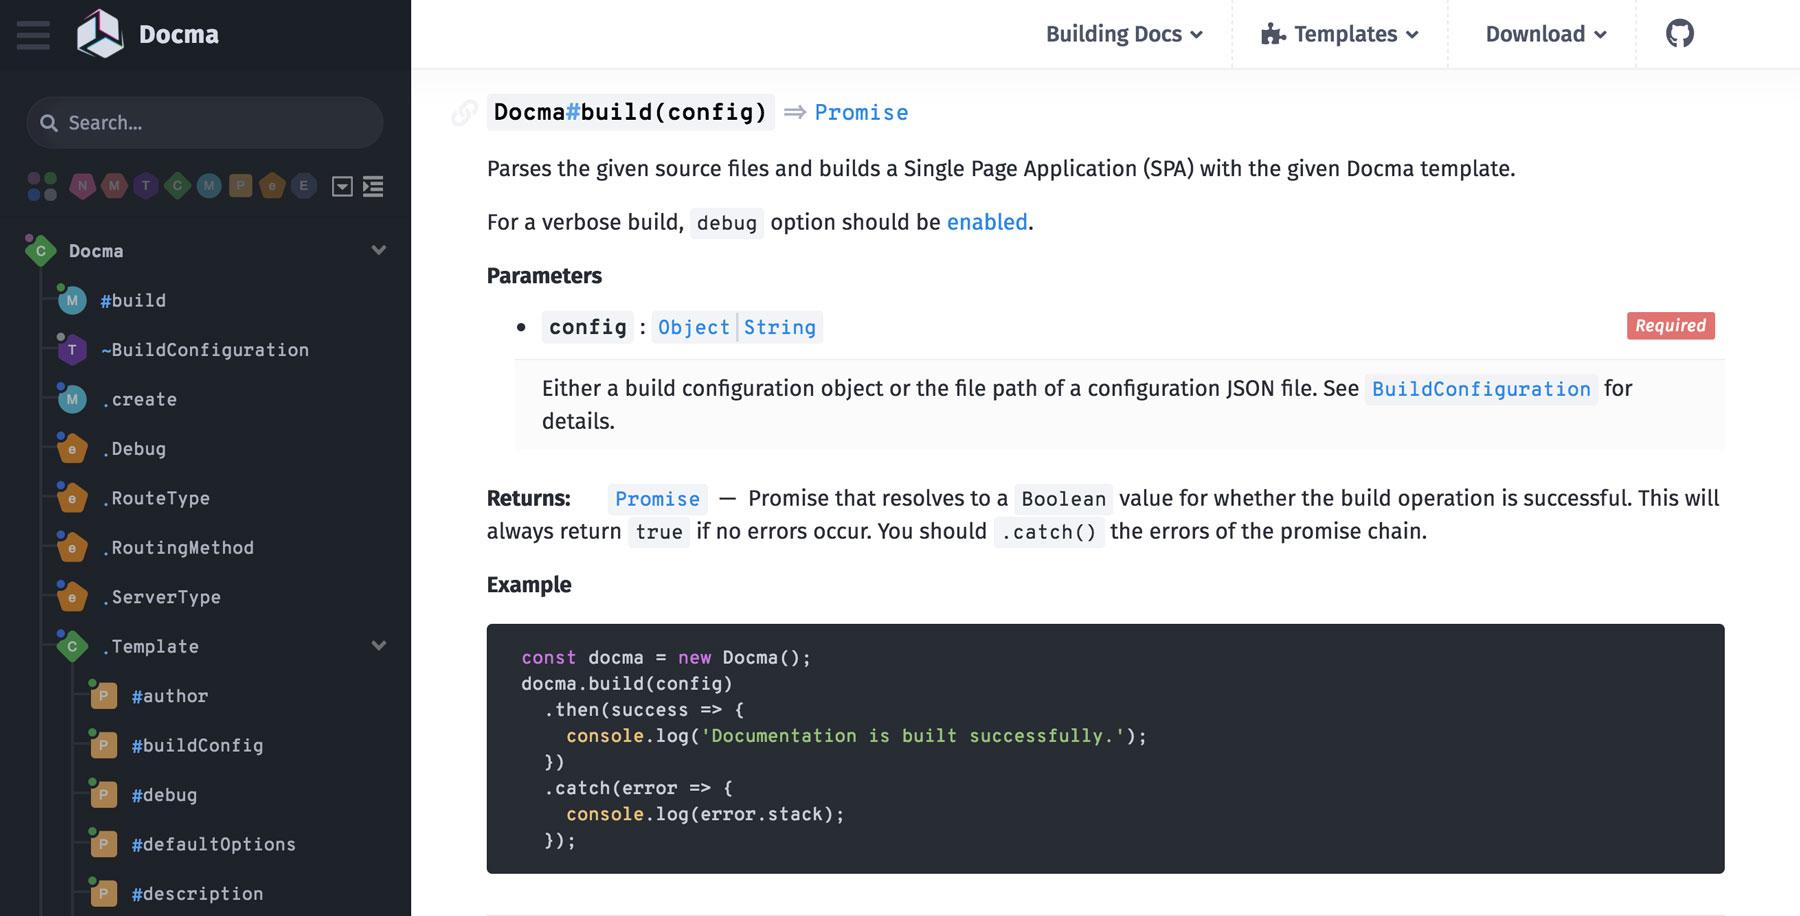 jsdoc templates - onury docma a powerful tool to easily generate beautiful